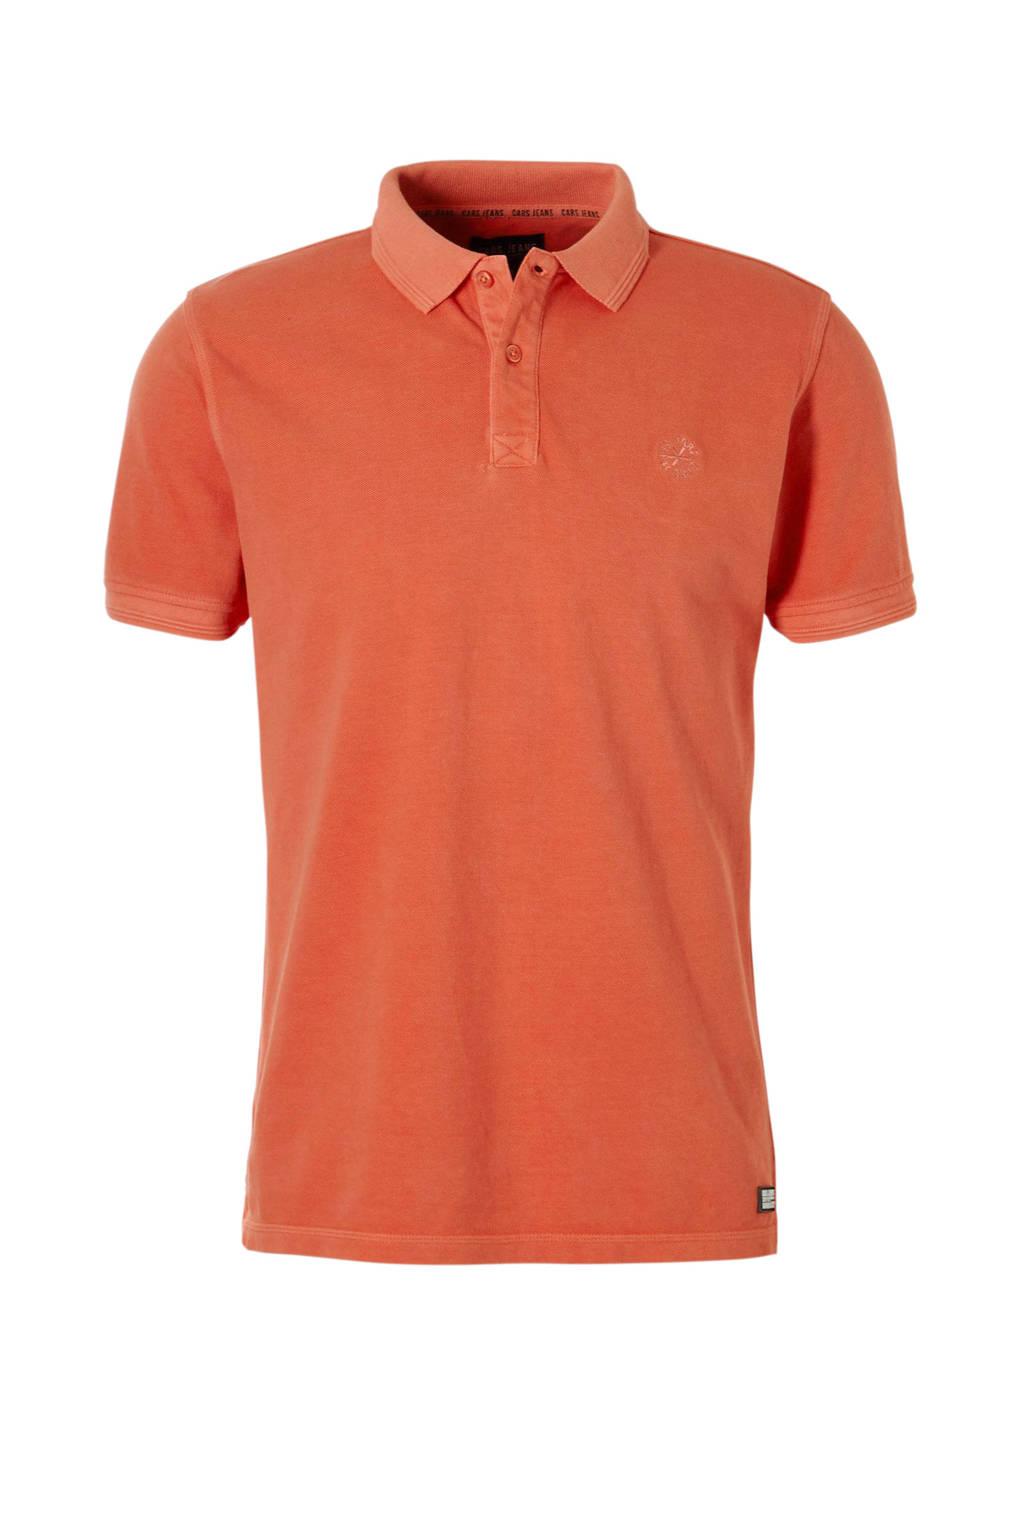 Cars Mason polo oranje, Oranje